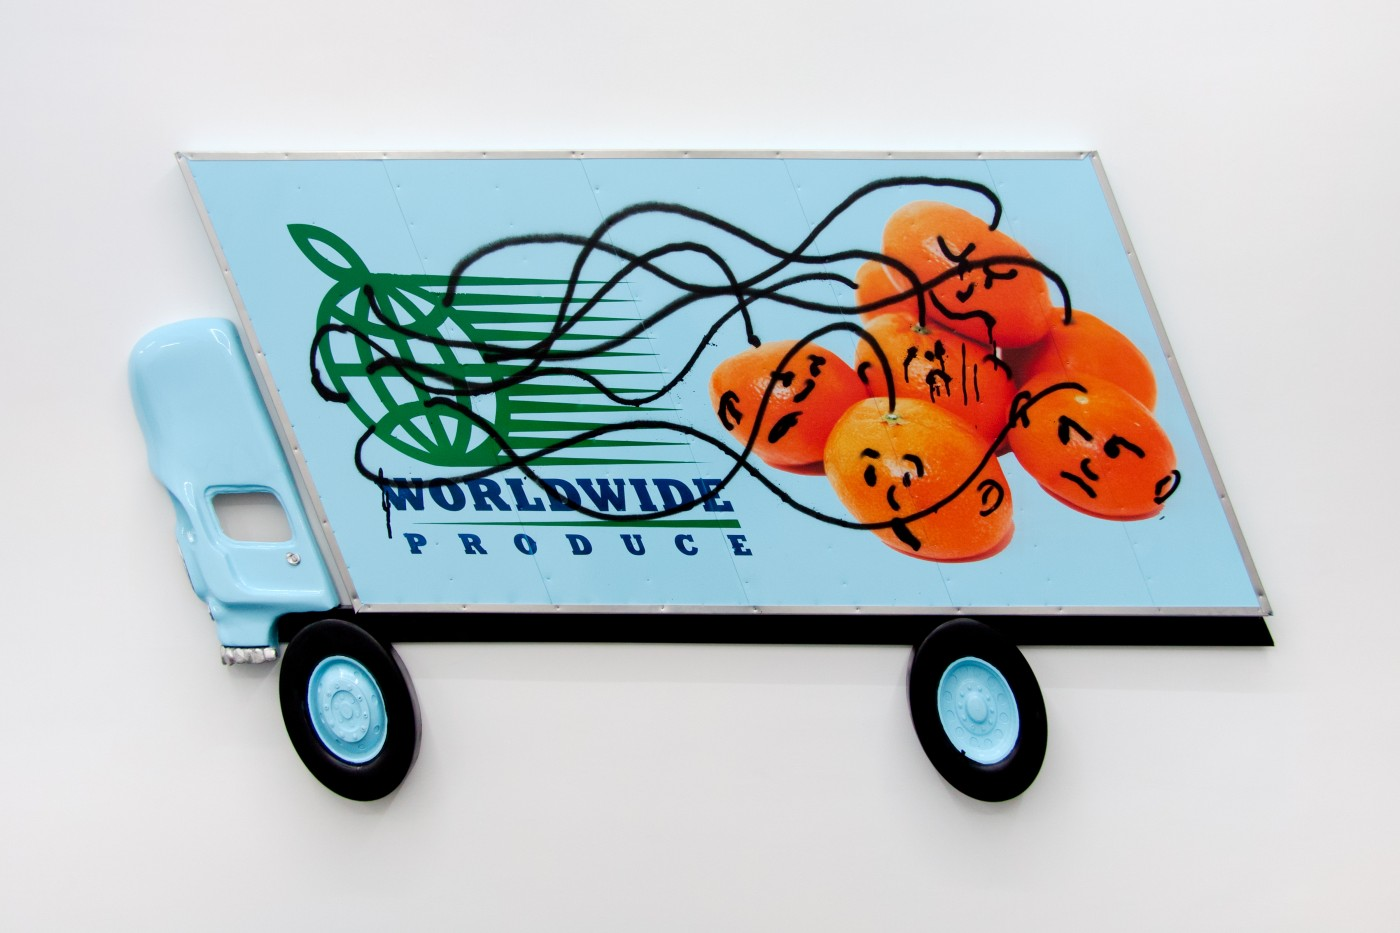 Wind Parade  Box Truck Painting (Clementines) , 2014   Inkjet, enamel, spray paint, urethane, pewter, aluminum, wood  80 x 160 x 3 cm / 31.4 x 63.9 x 1.2 in   Pentti Monkkonen